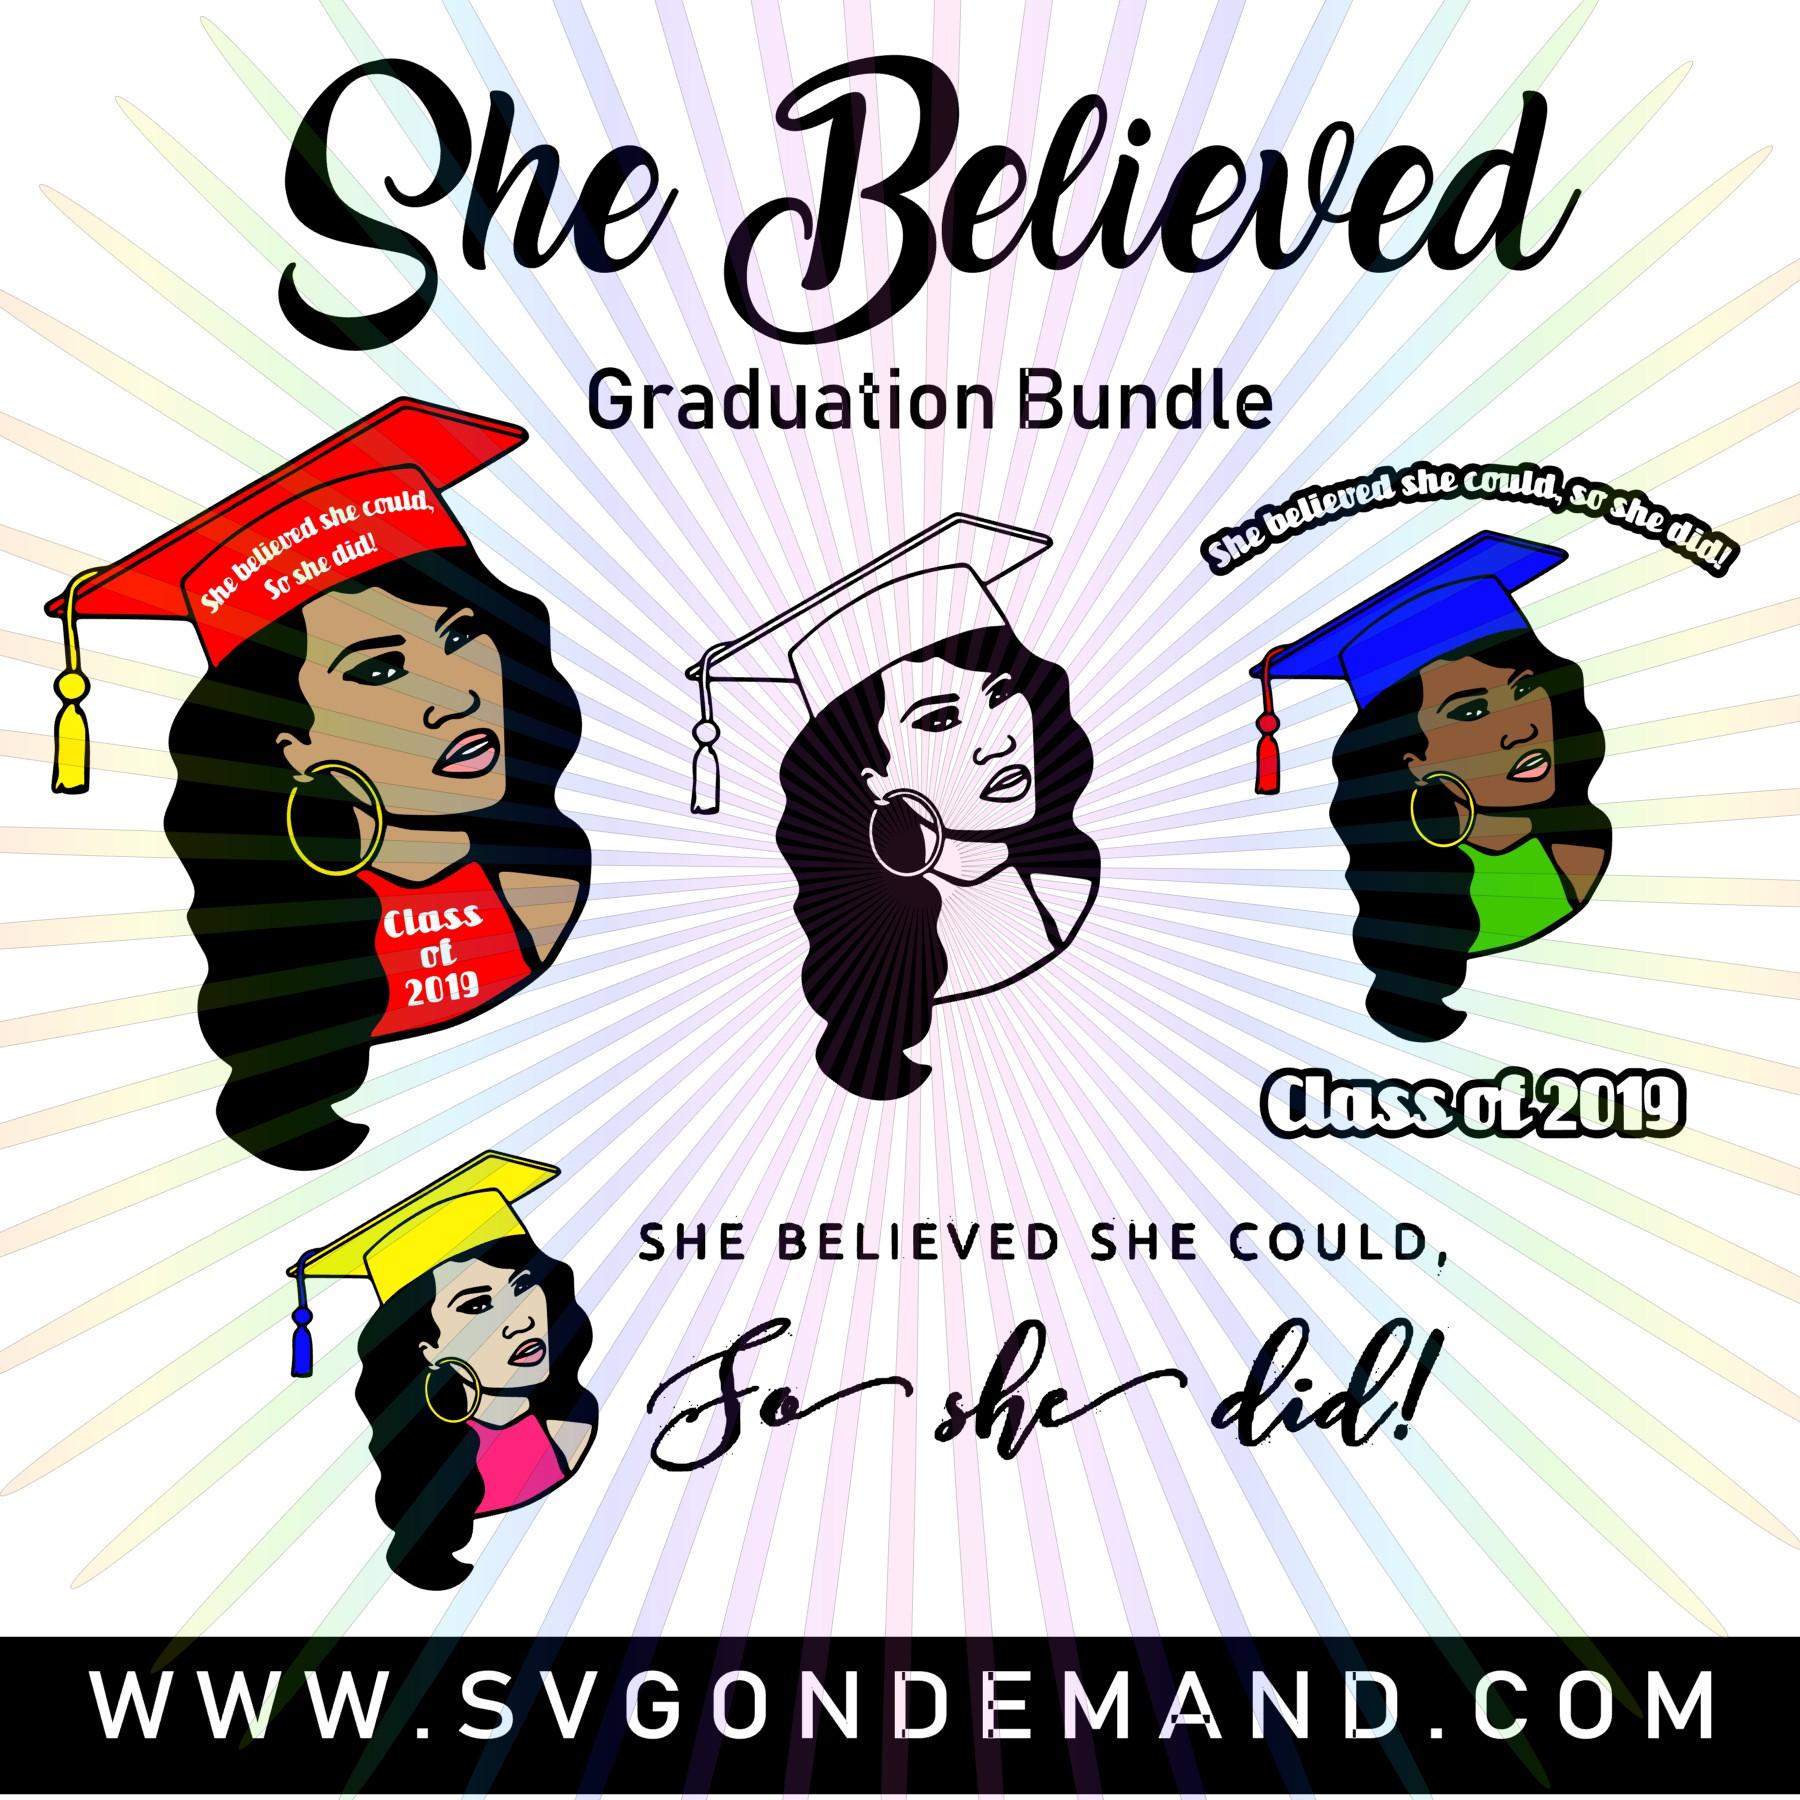 She Believed Graduation Bundle